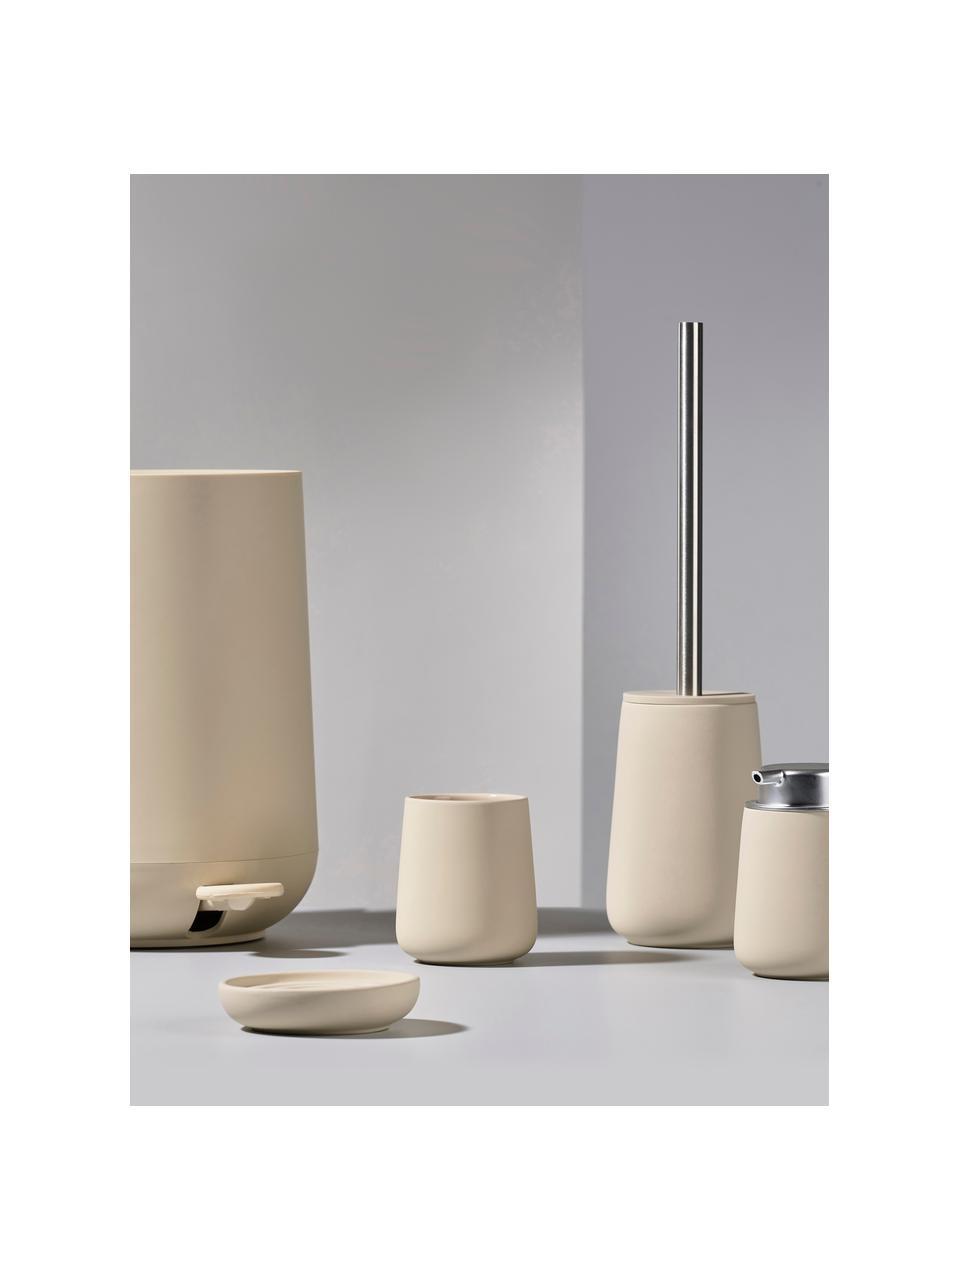 Porzellan-Seifenschale Nova One, Porzellan, Beige, Ø 11 x H 3 cm